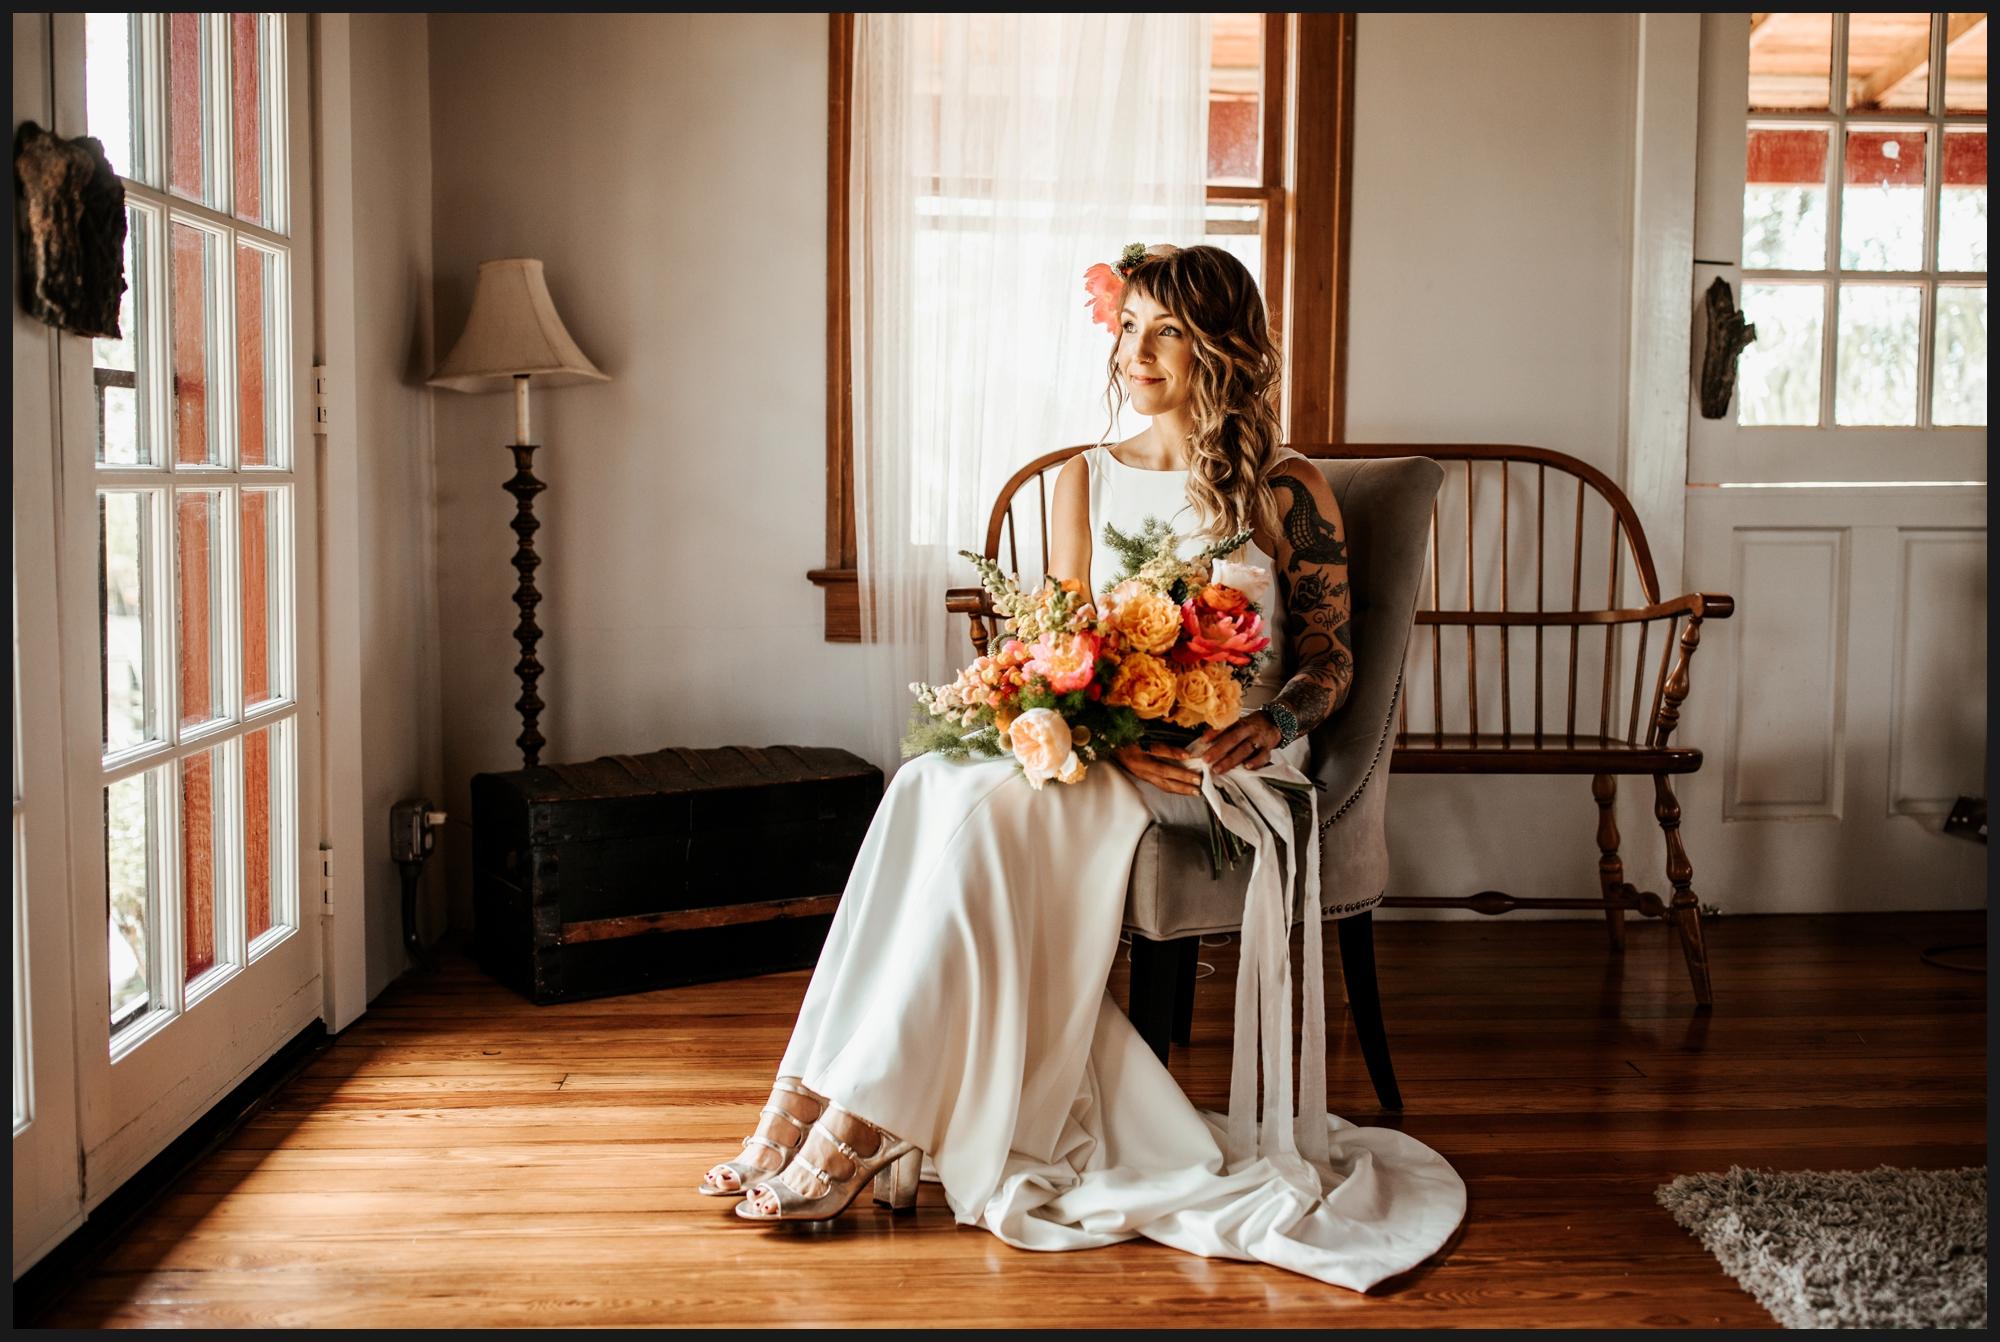 Orlando-Wedding-Photographer-destination-wedding-photographer-florida-wedding-photographer-bohemian-wedding-photographer_1970.jpg